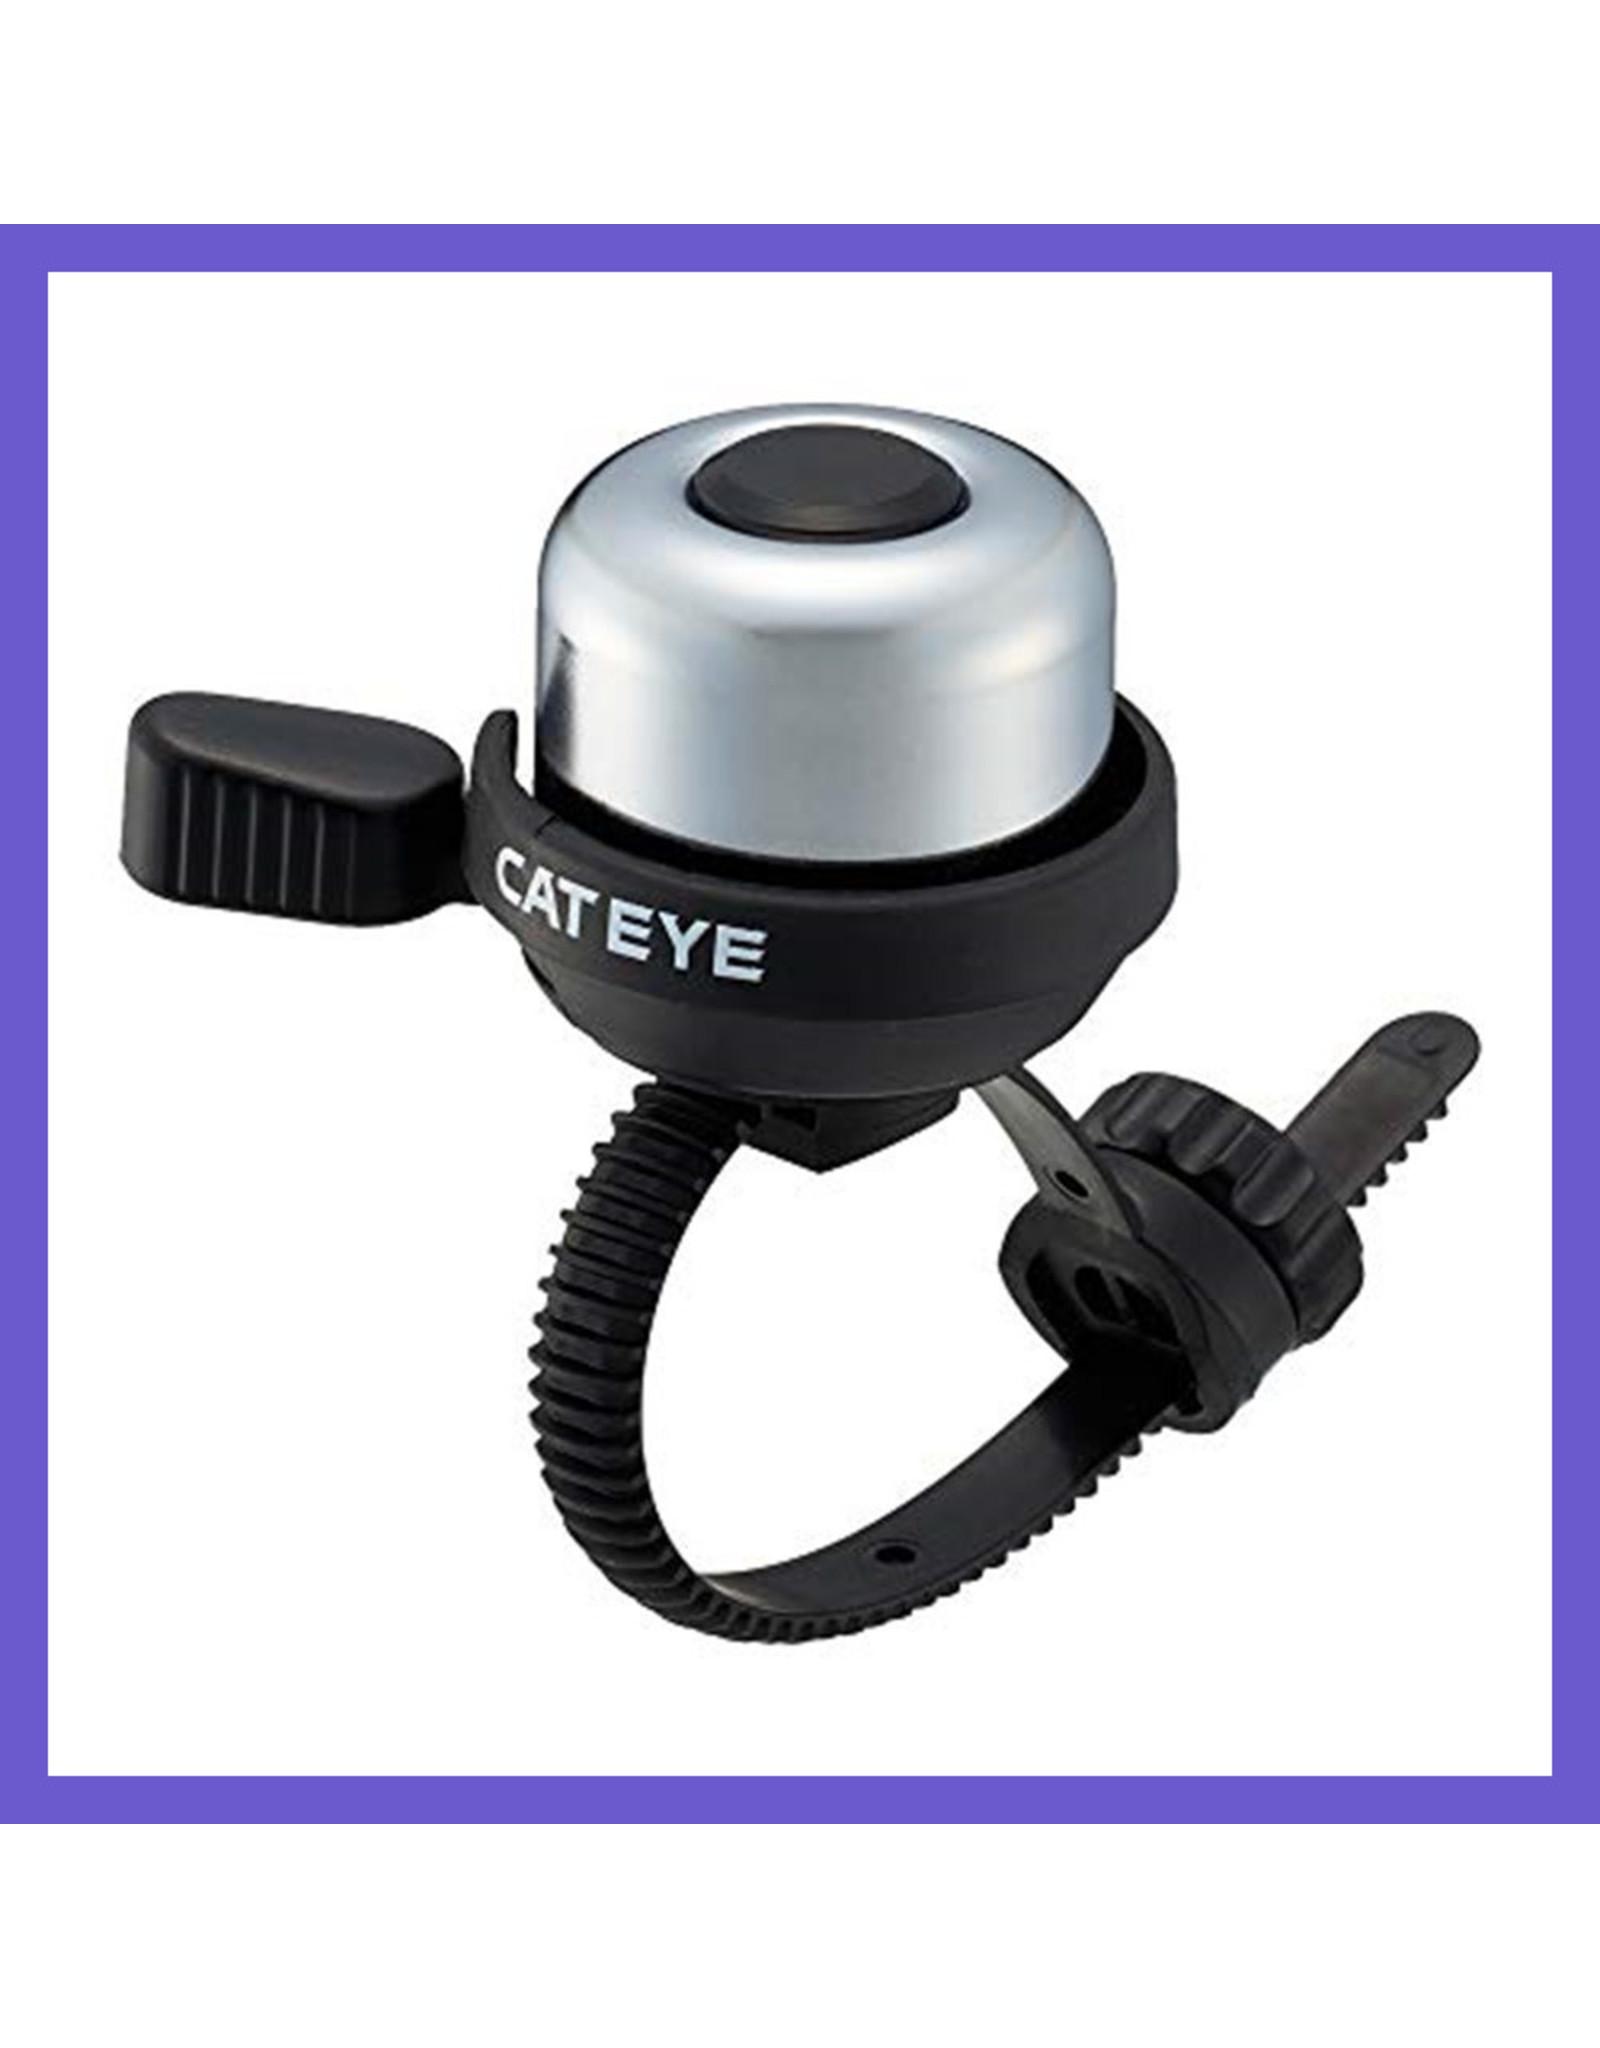 CATEYE CatEye PB-1100 Bell, Silver Black